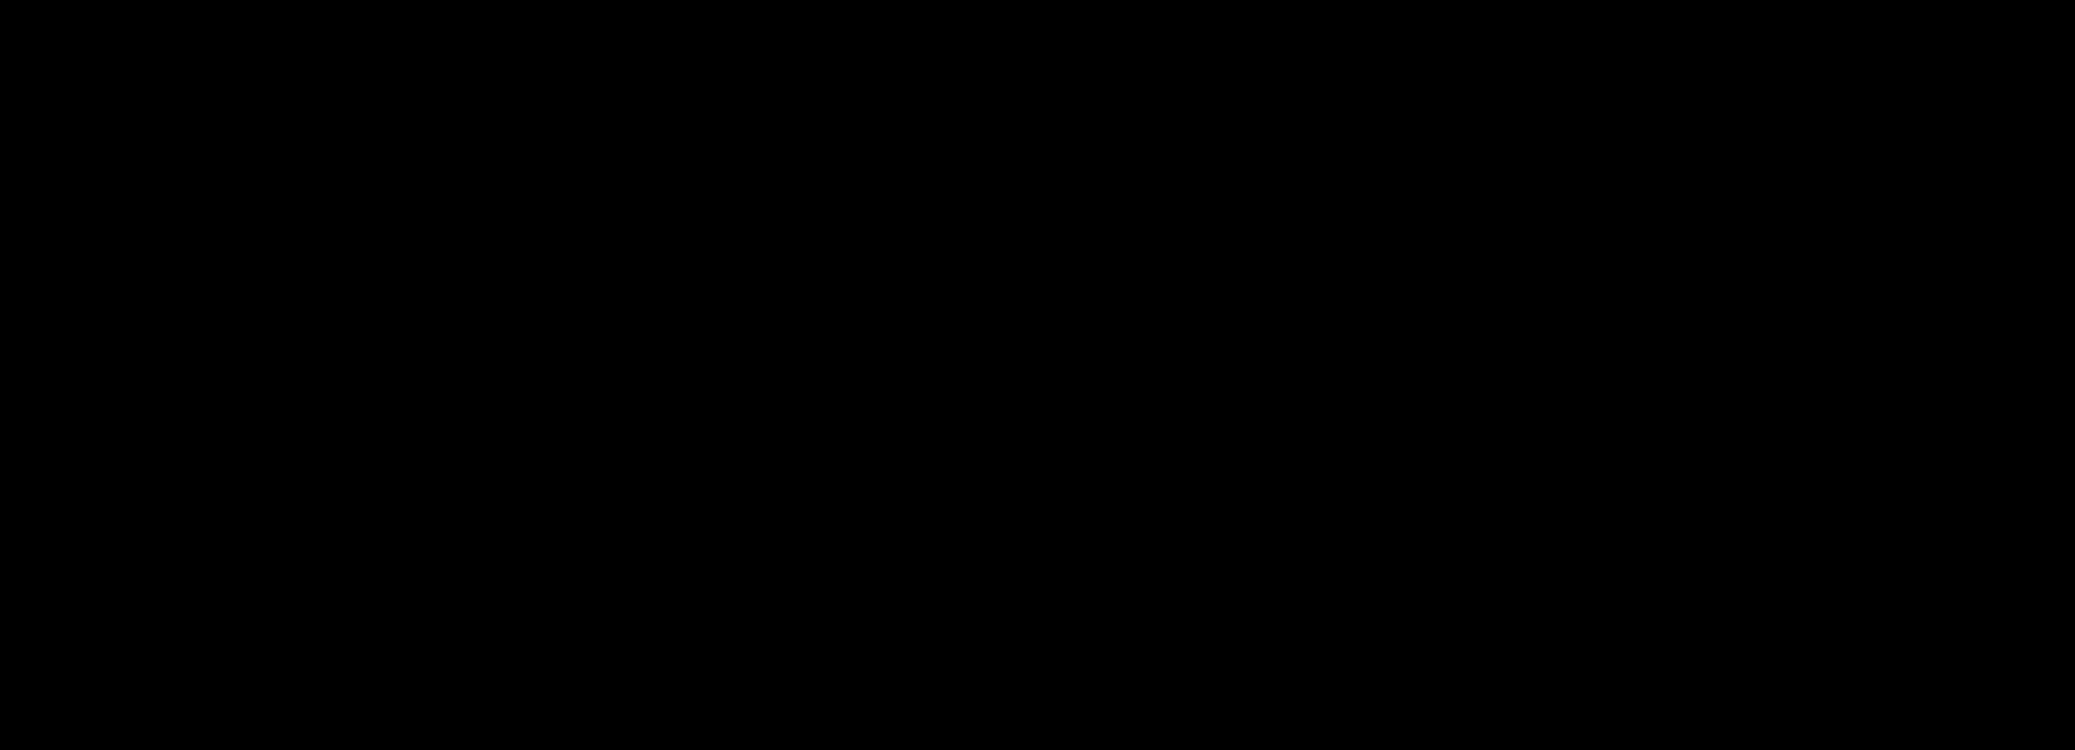 Triangle,Line Art,Silhouette